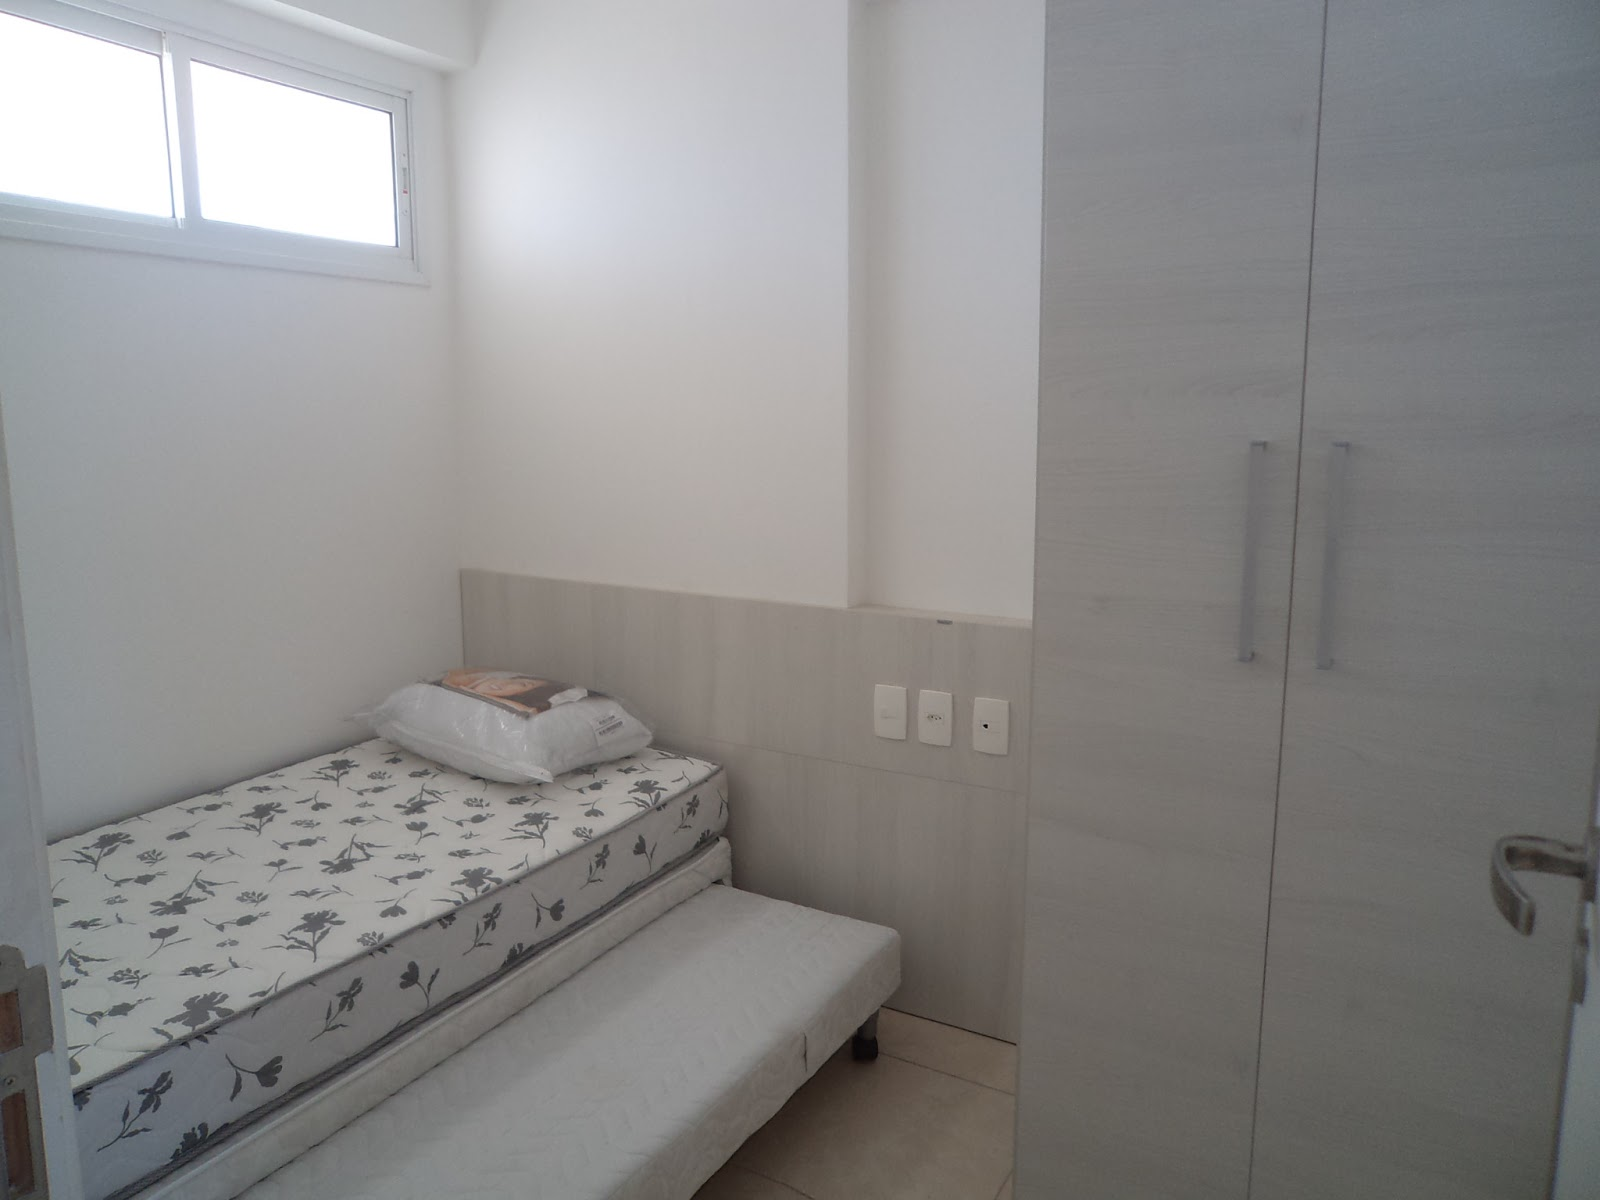 Aluguel por temporada em Fortaleza: APARTAMENTO NA PRAIA DO FUTURO  #595149 1600x1200 Banheiro Container Fortaleza